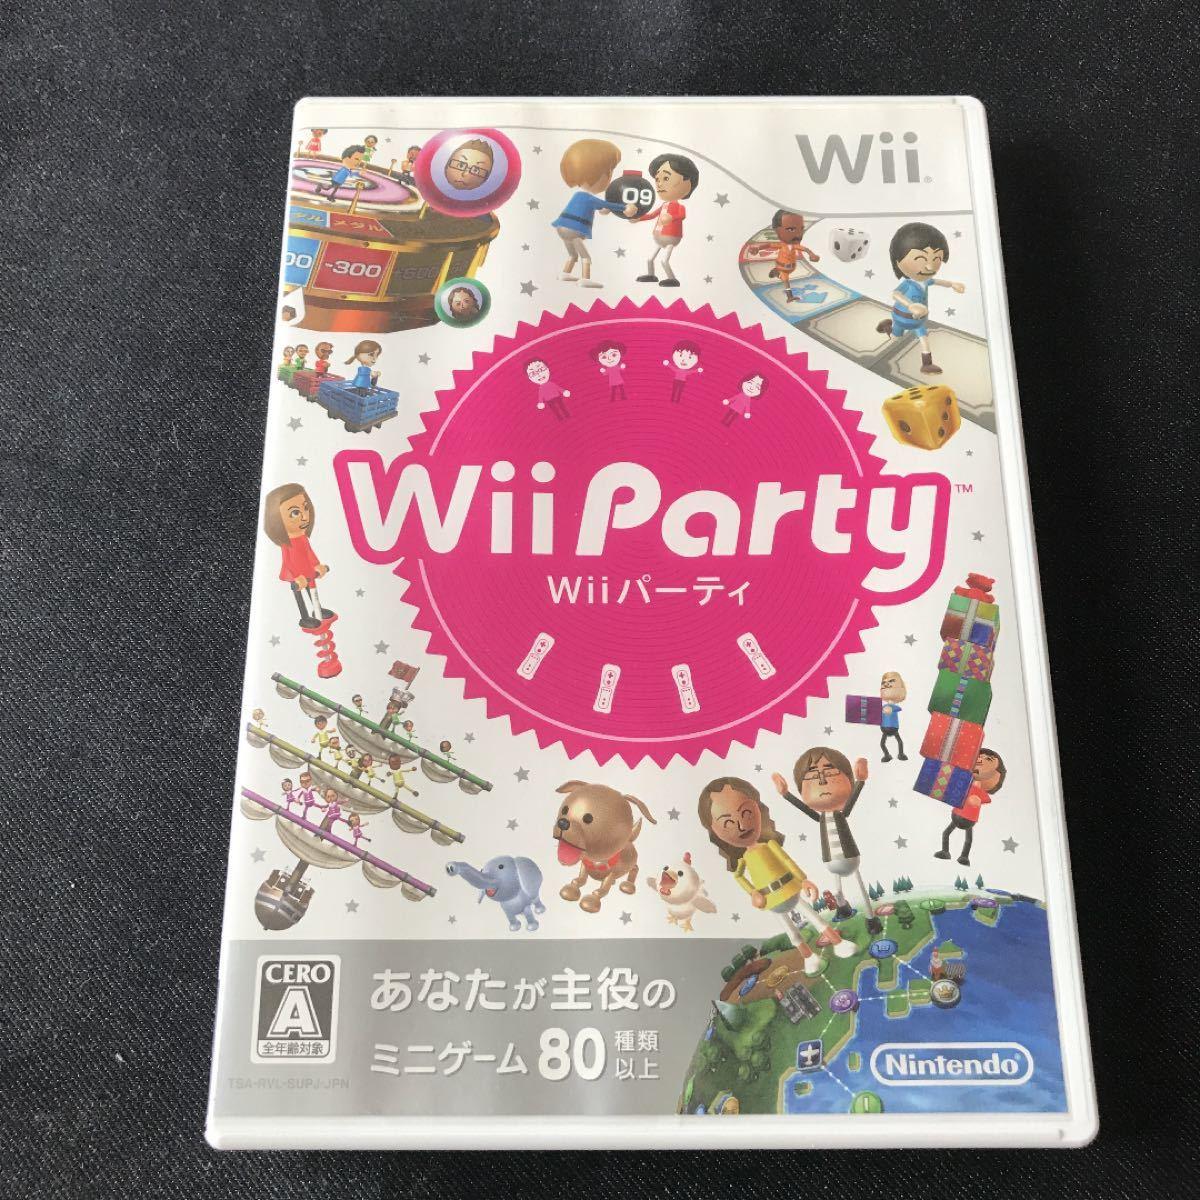 Wii Party ウィーパーティー